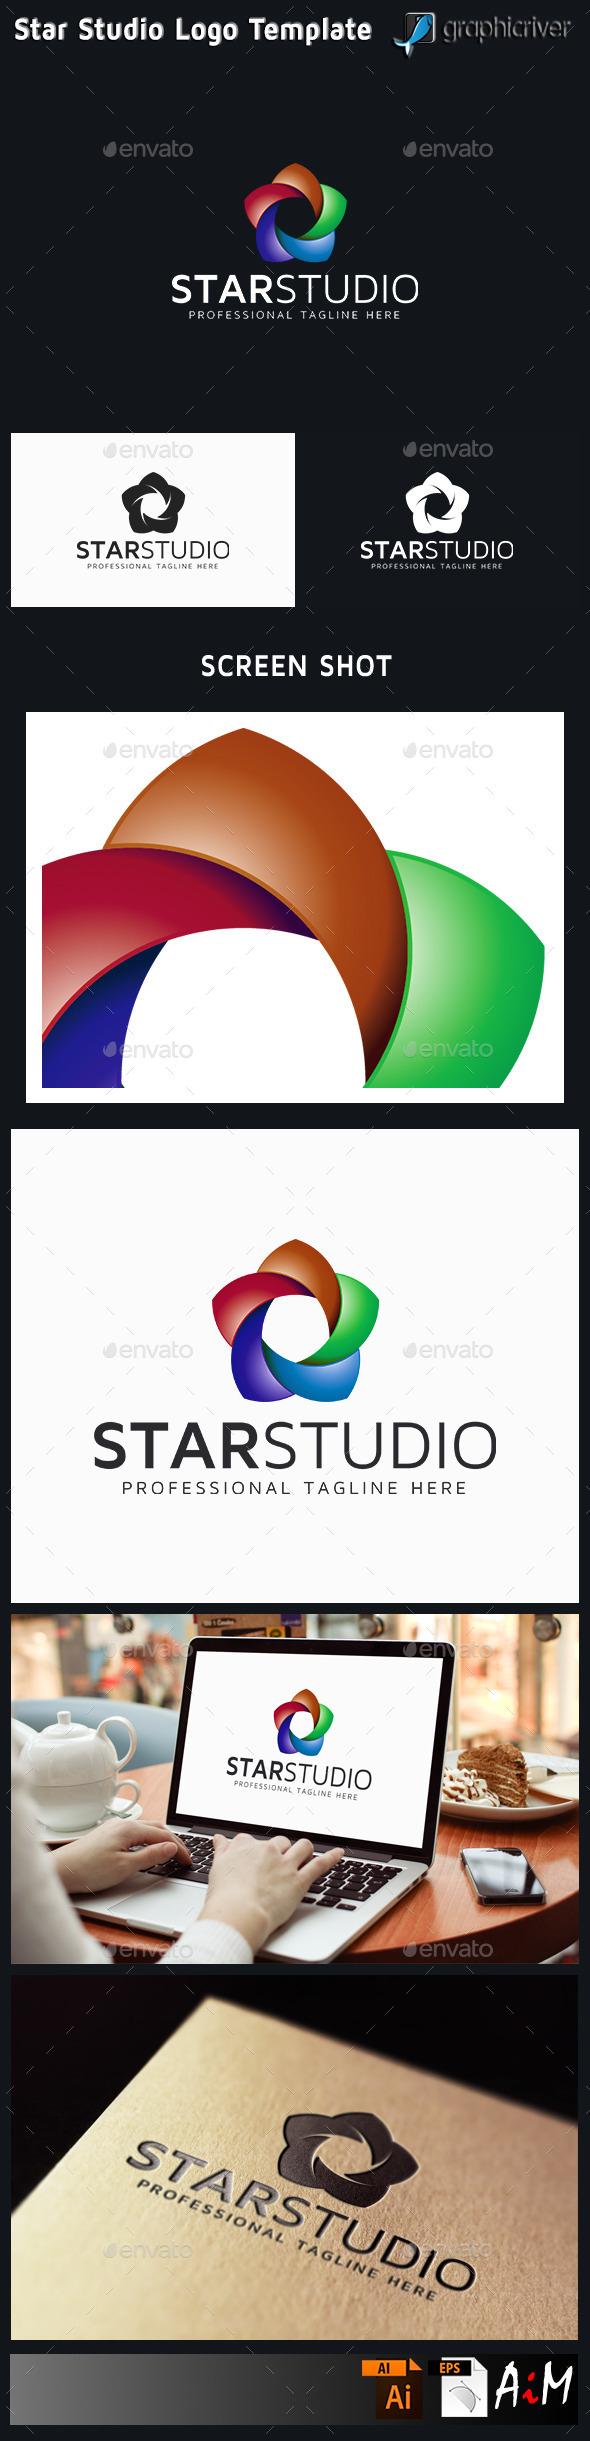 Star Studio Logo - 3d Abstract